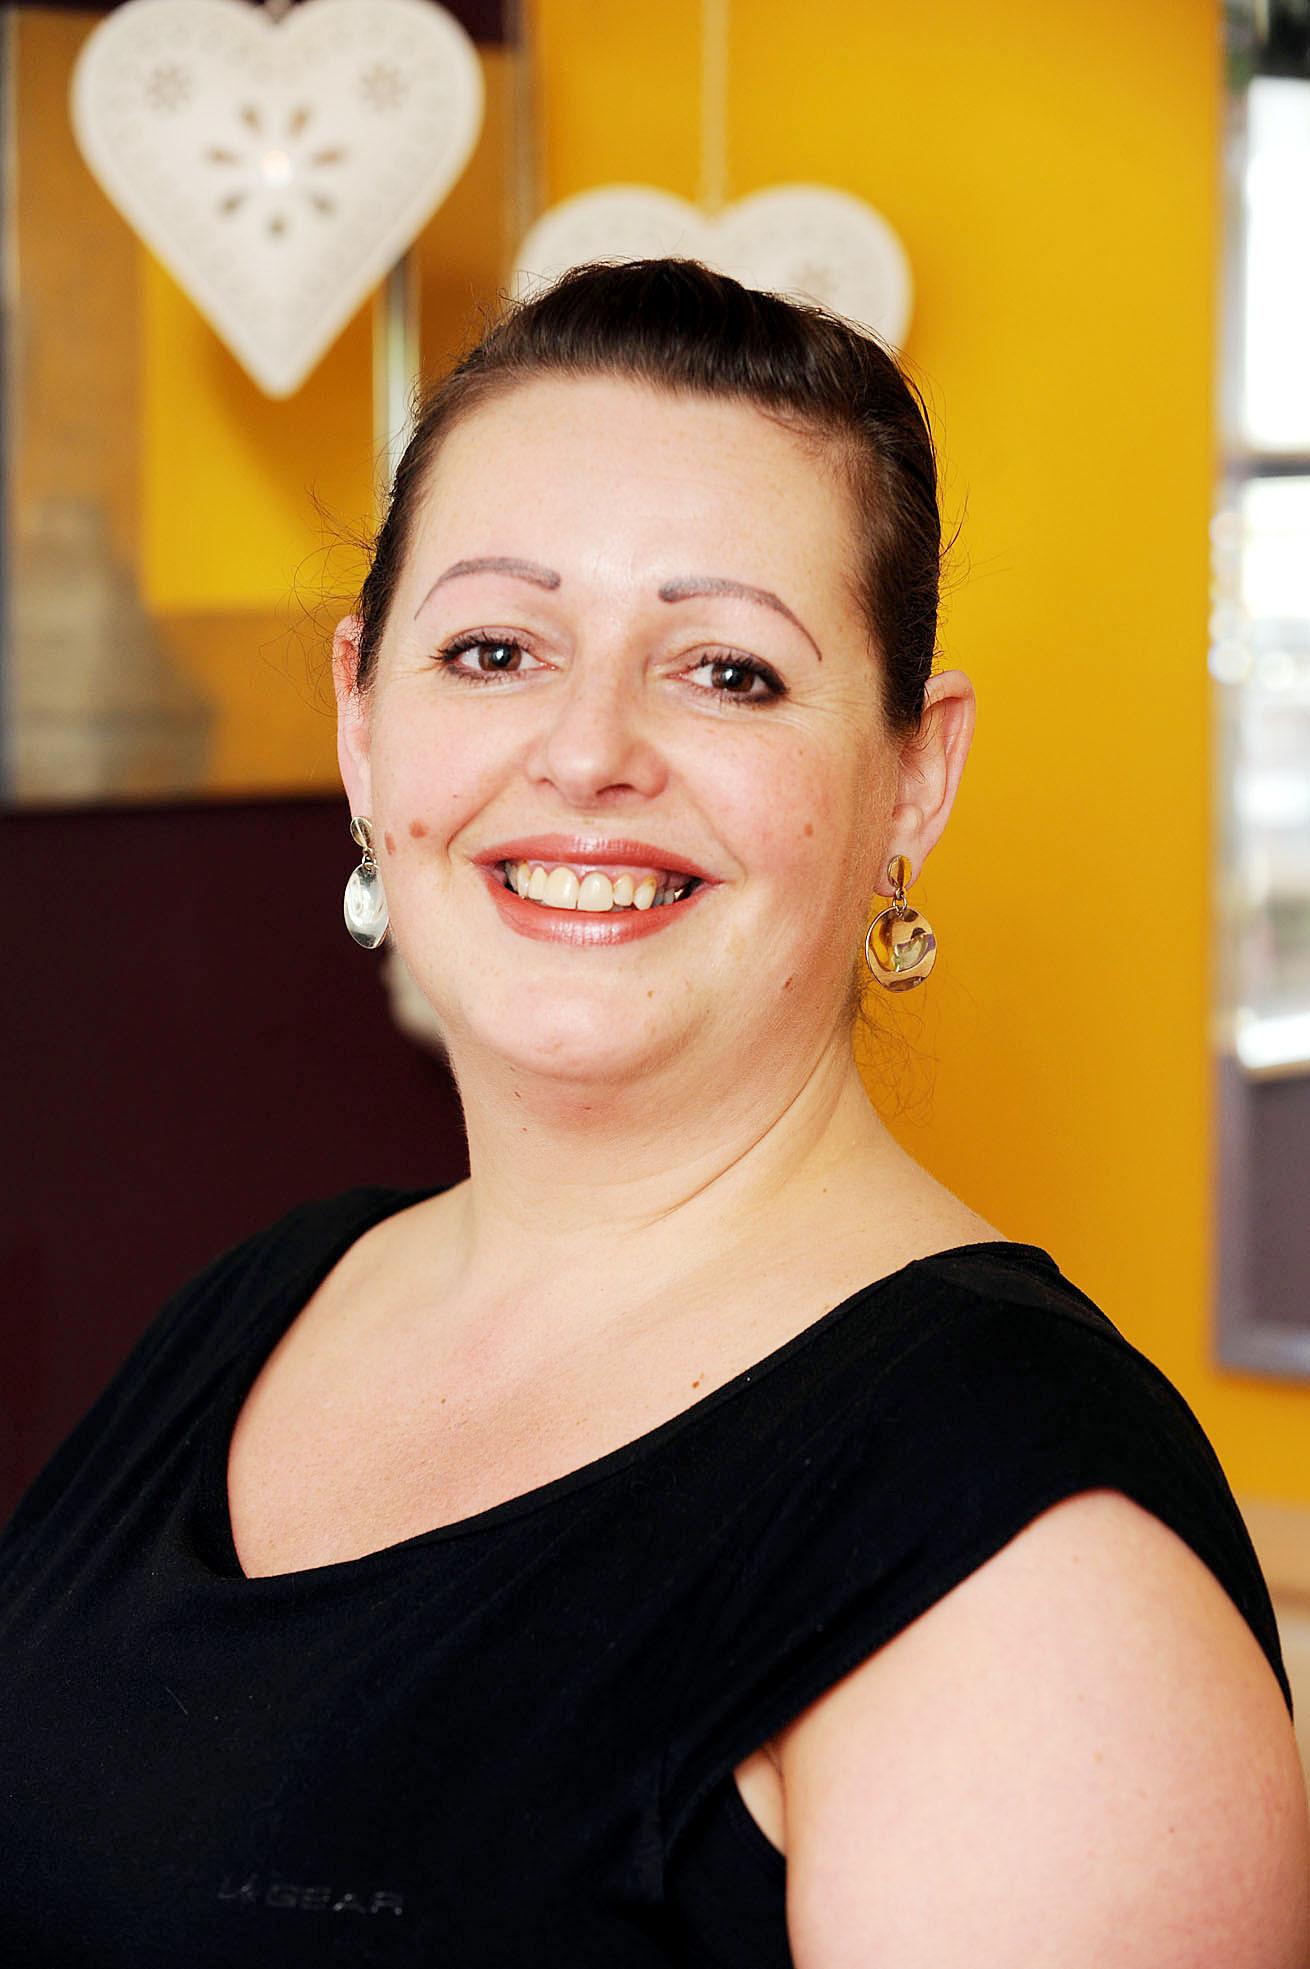 Holistic therapist Angela Dean - 3499236